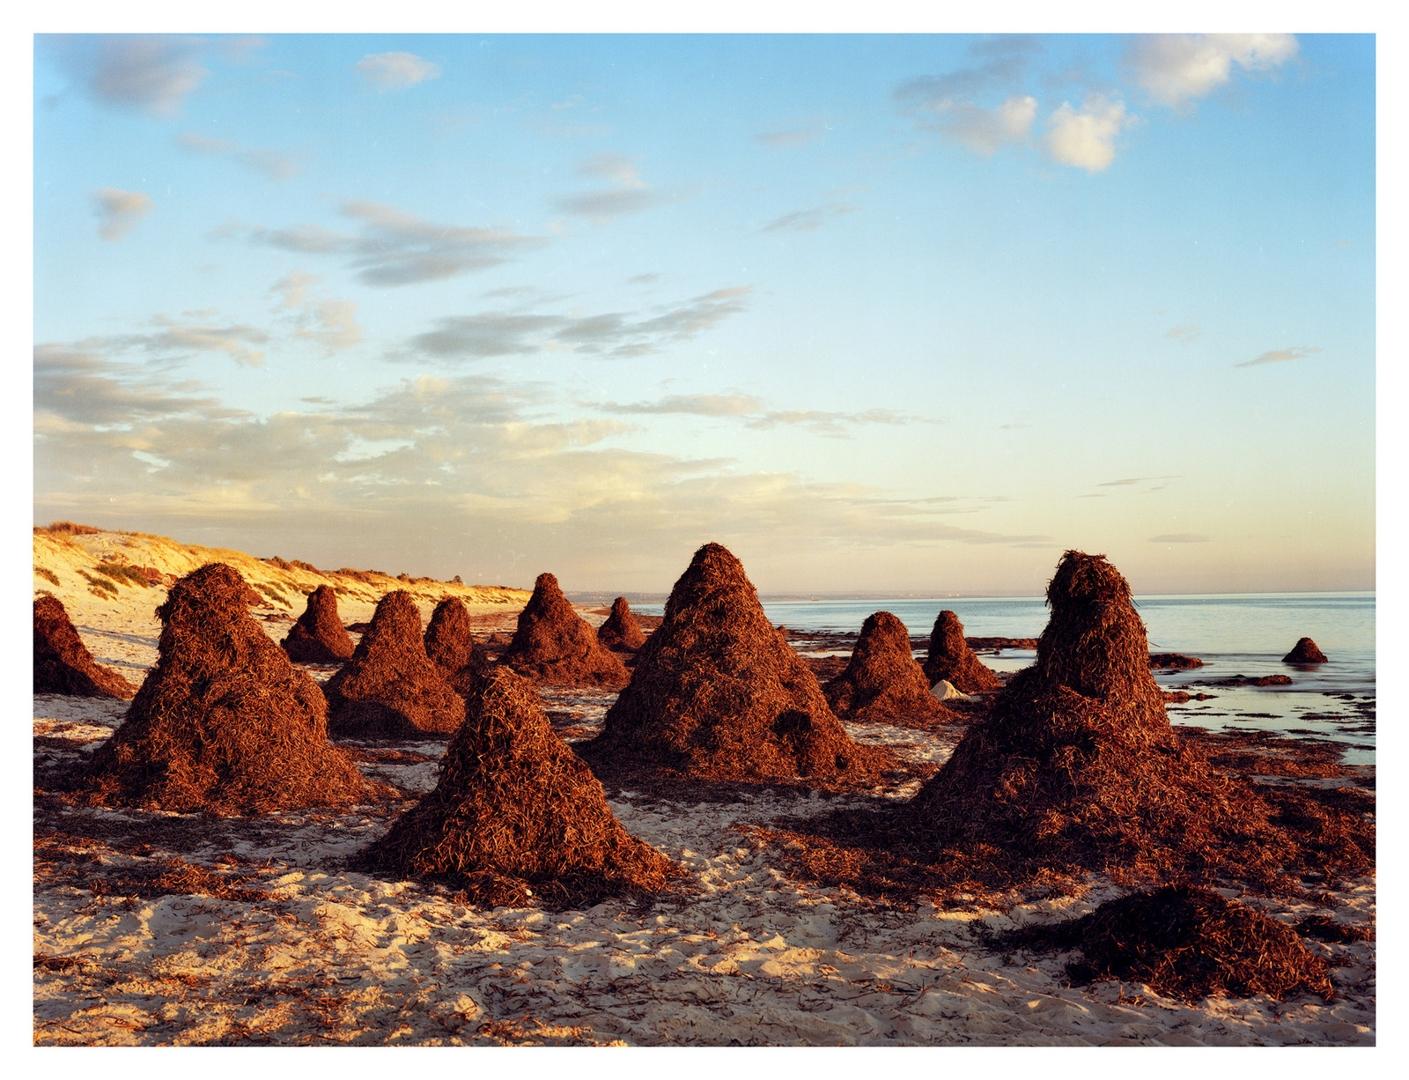 Seaweed Stacks image